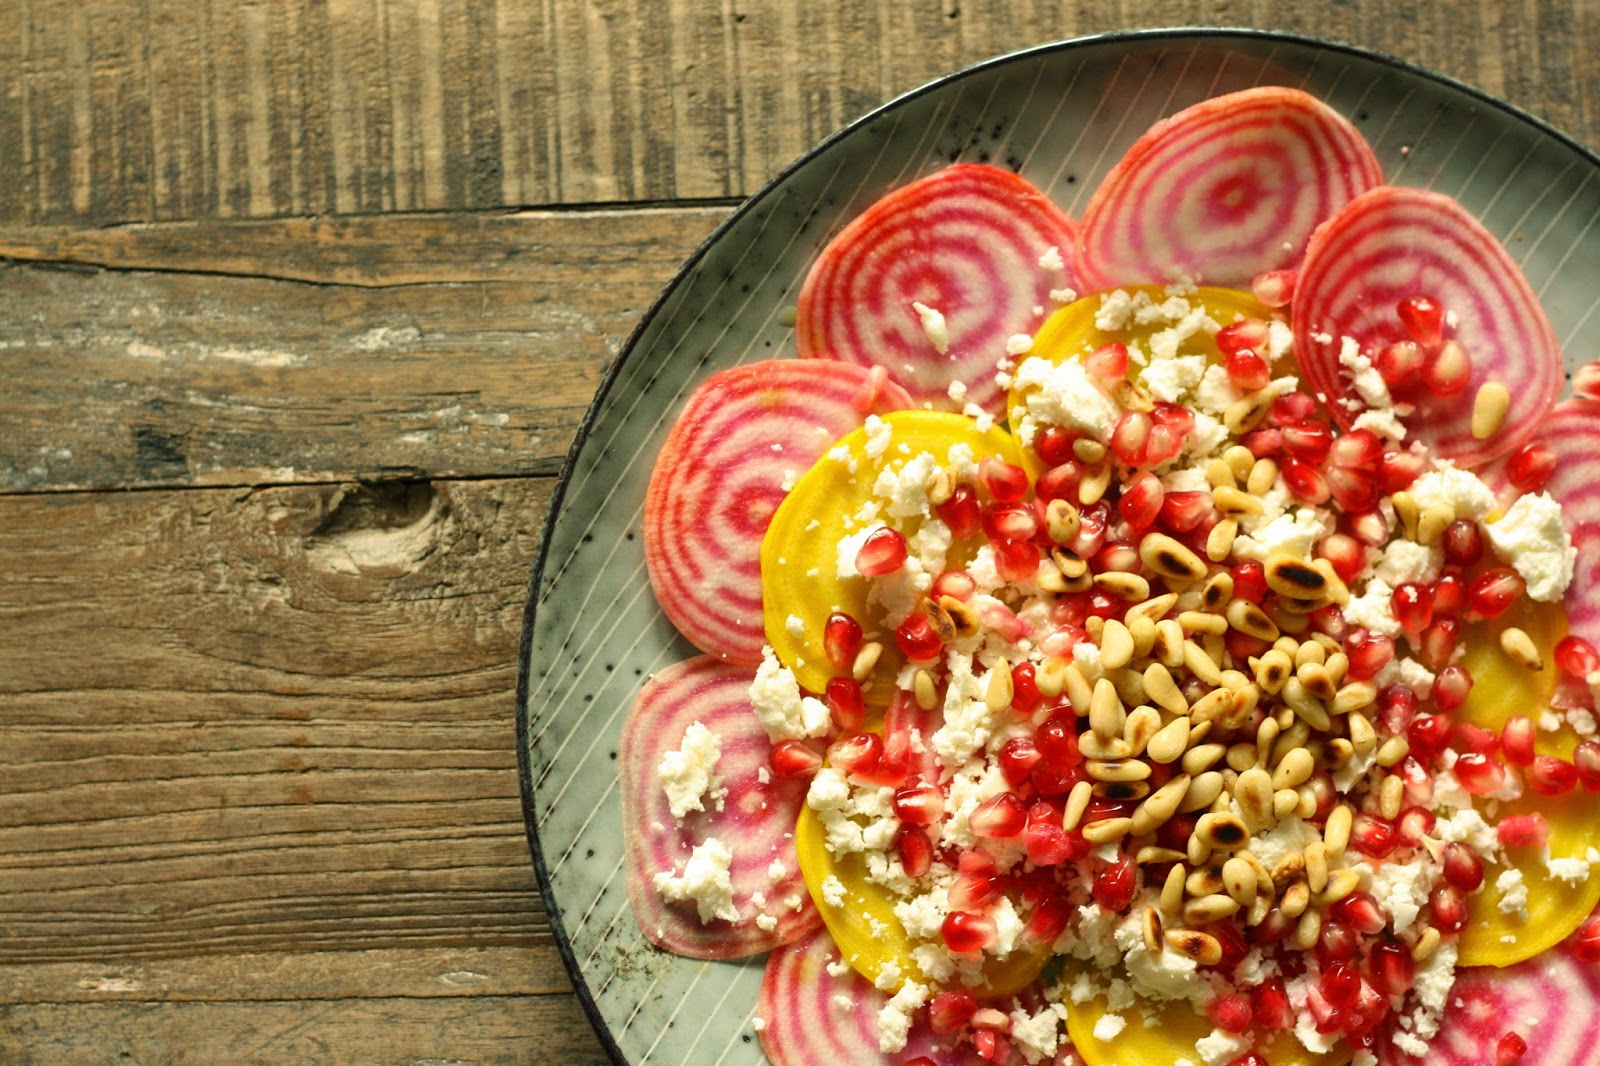 MissMuffin: Rødbedesalat med feta, pinjekerner og granatæble